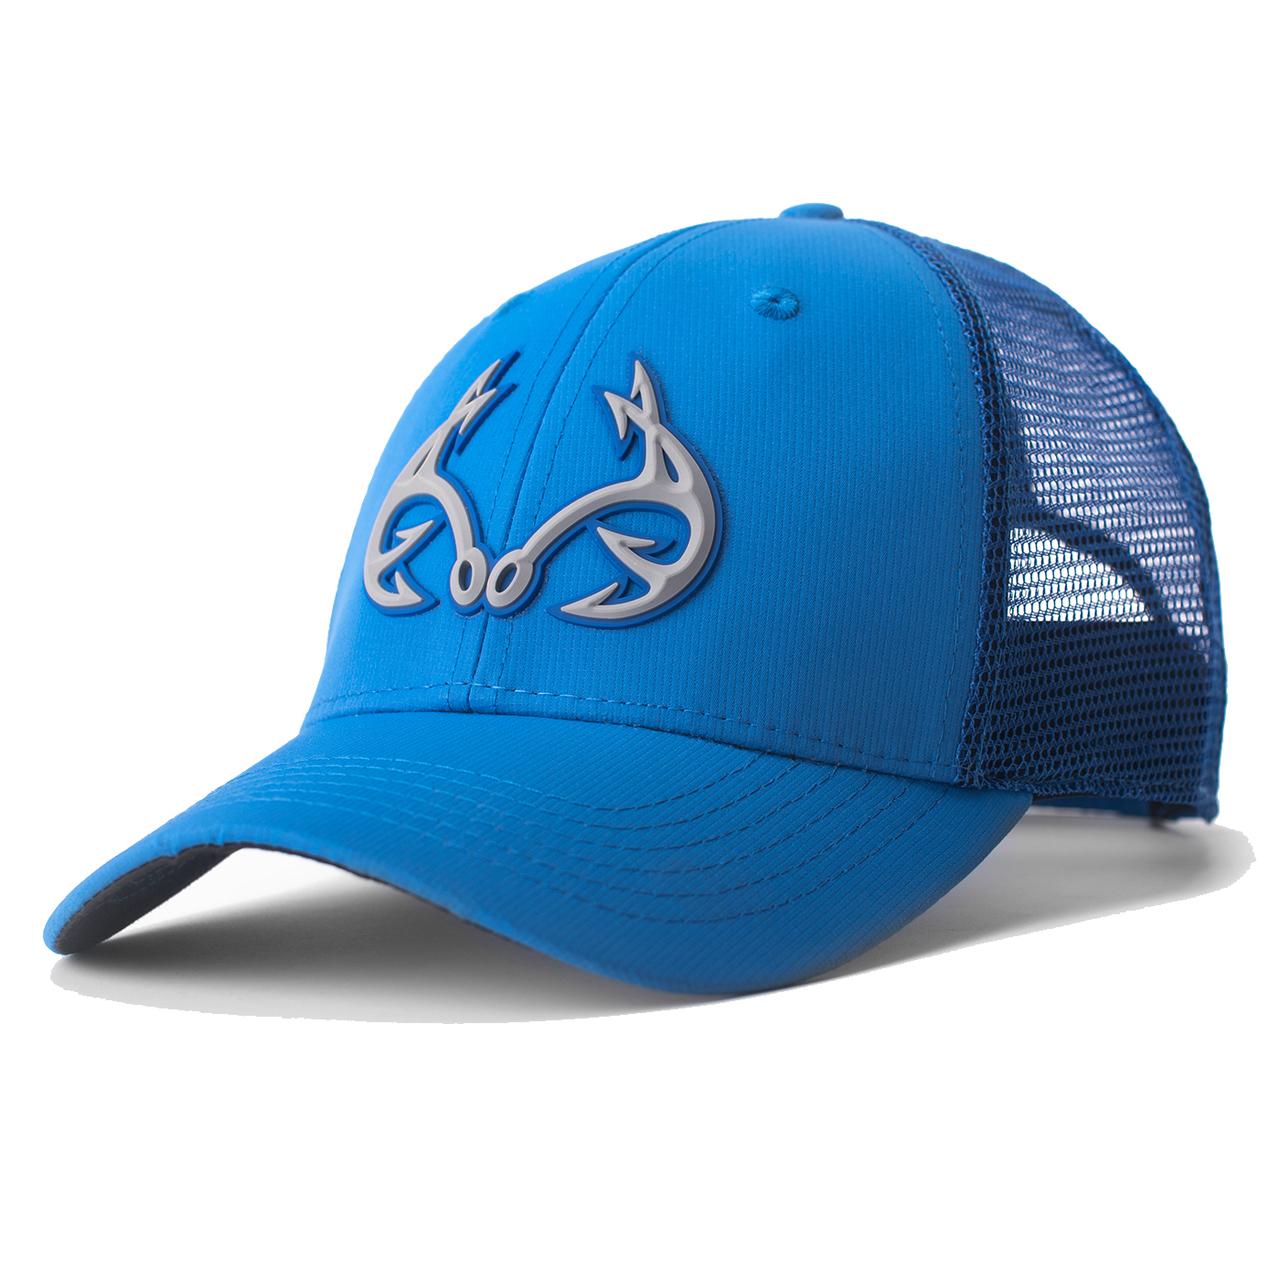 Realtree Fishing 3D Logo Blue Hat  f5de3668e57